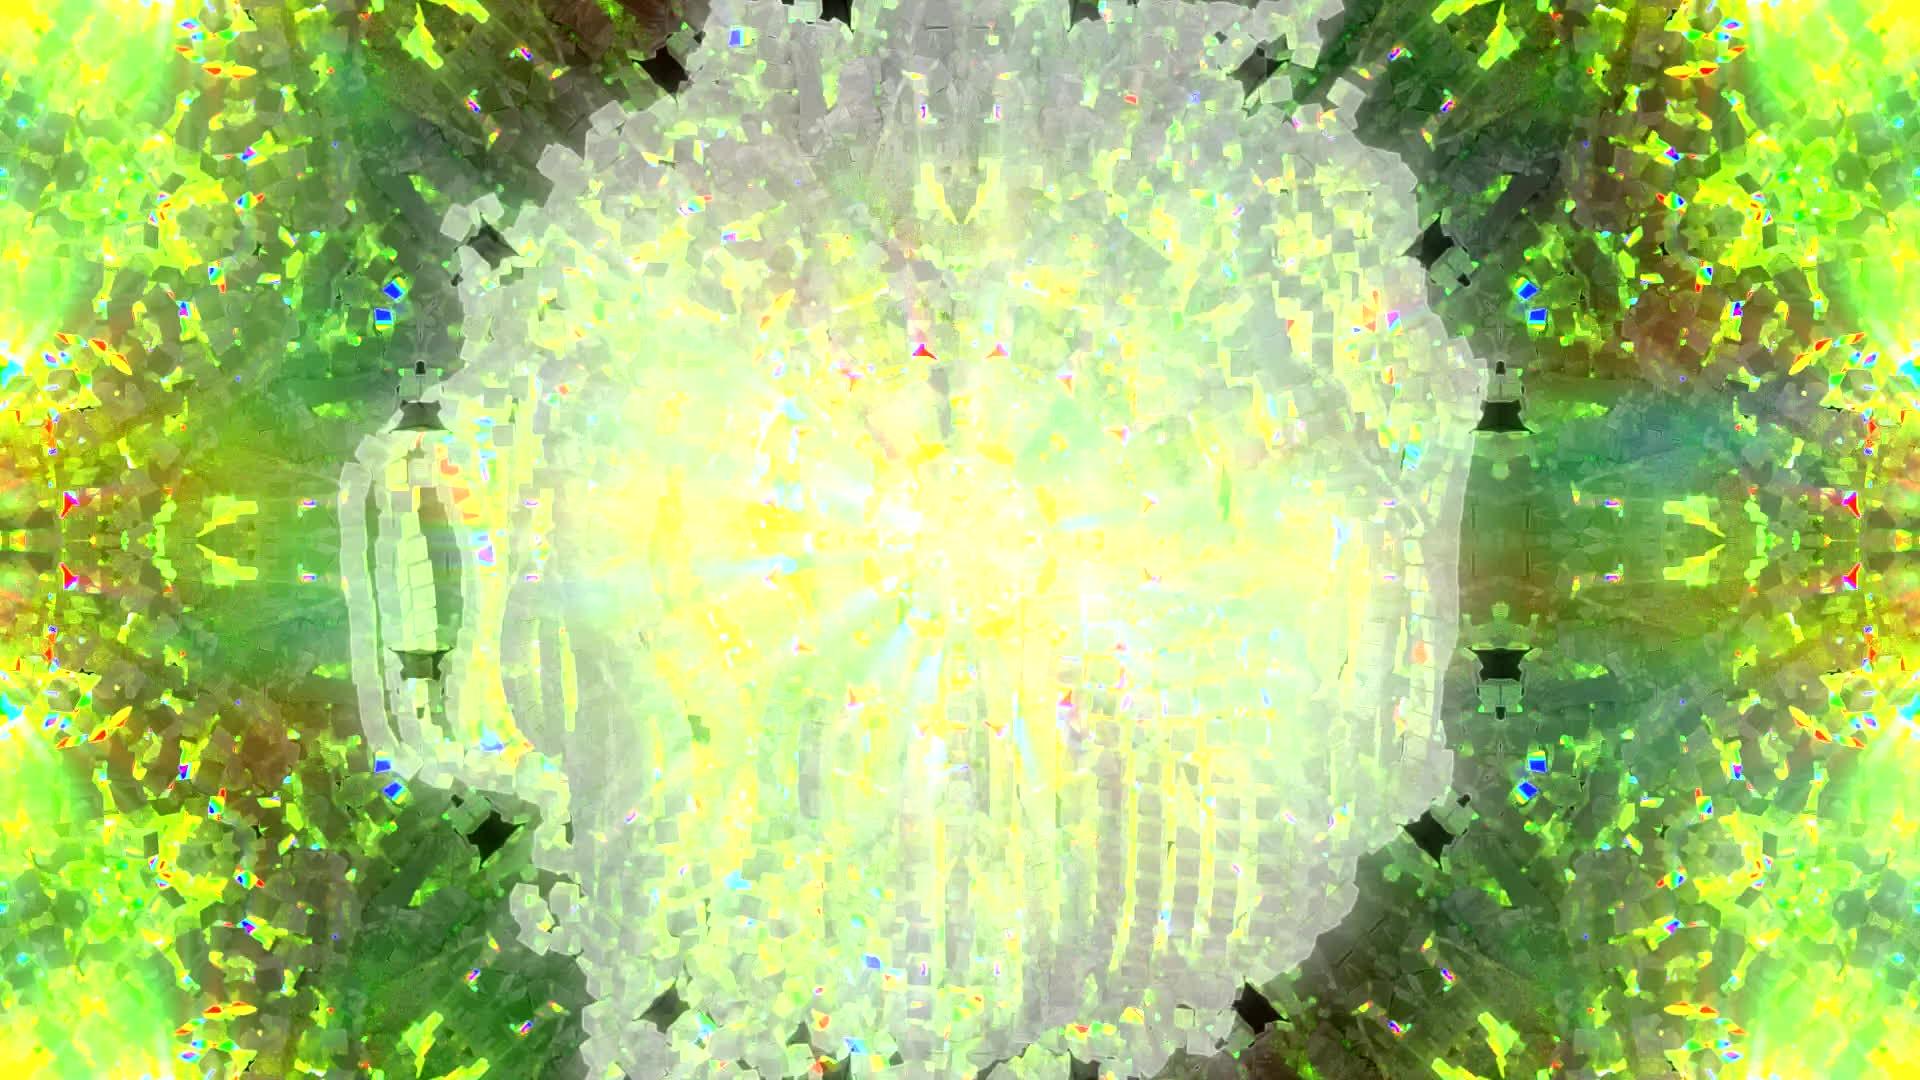 replications, Chrysanthemum GIFs